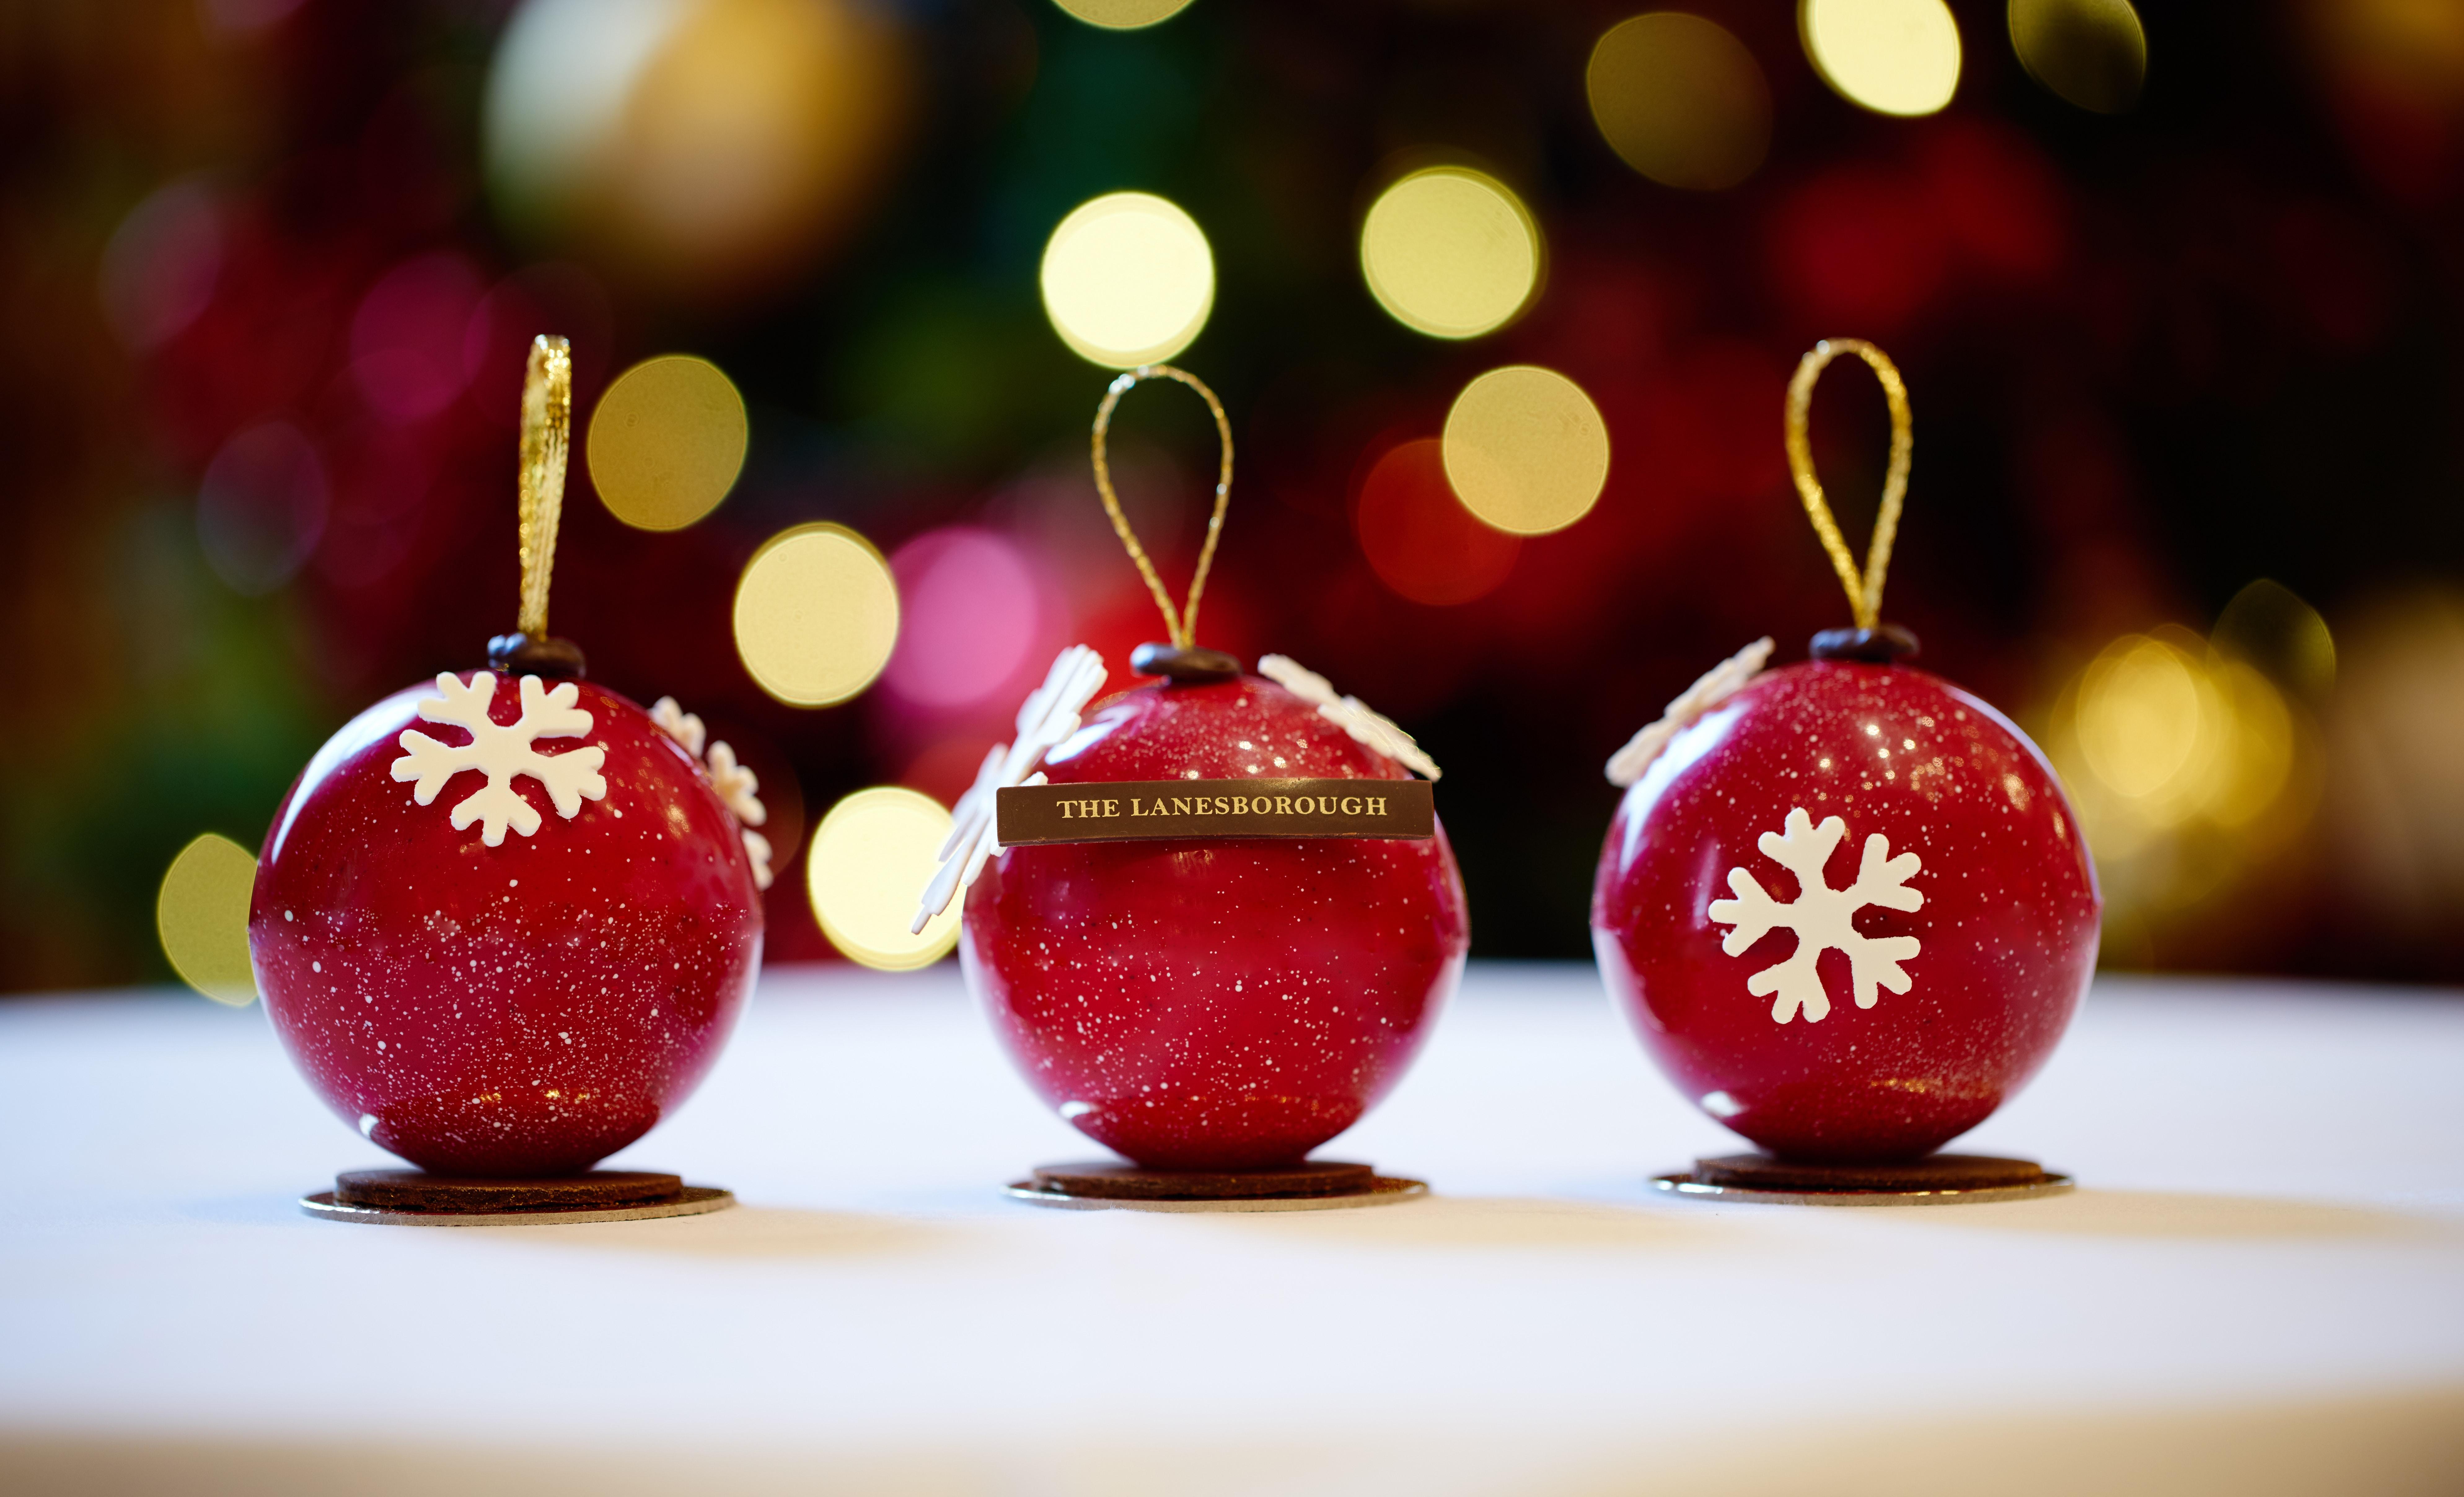 The-Lanesborough-Christmas-Luxury-Restaurant-Guide-3